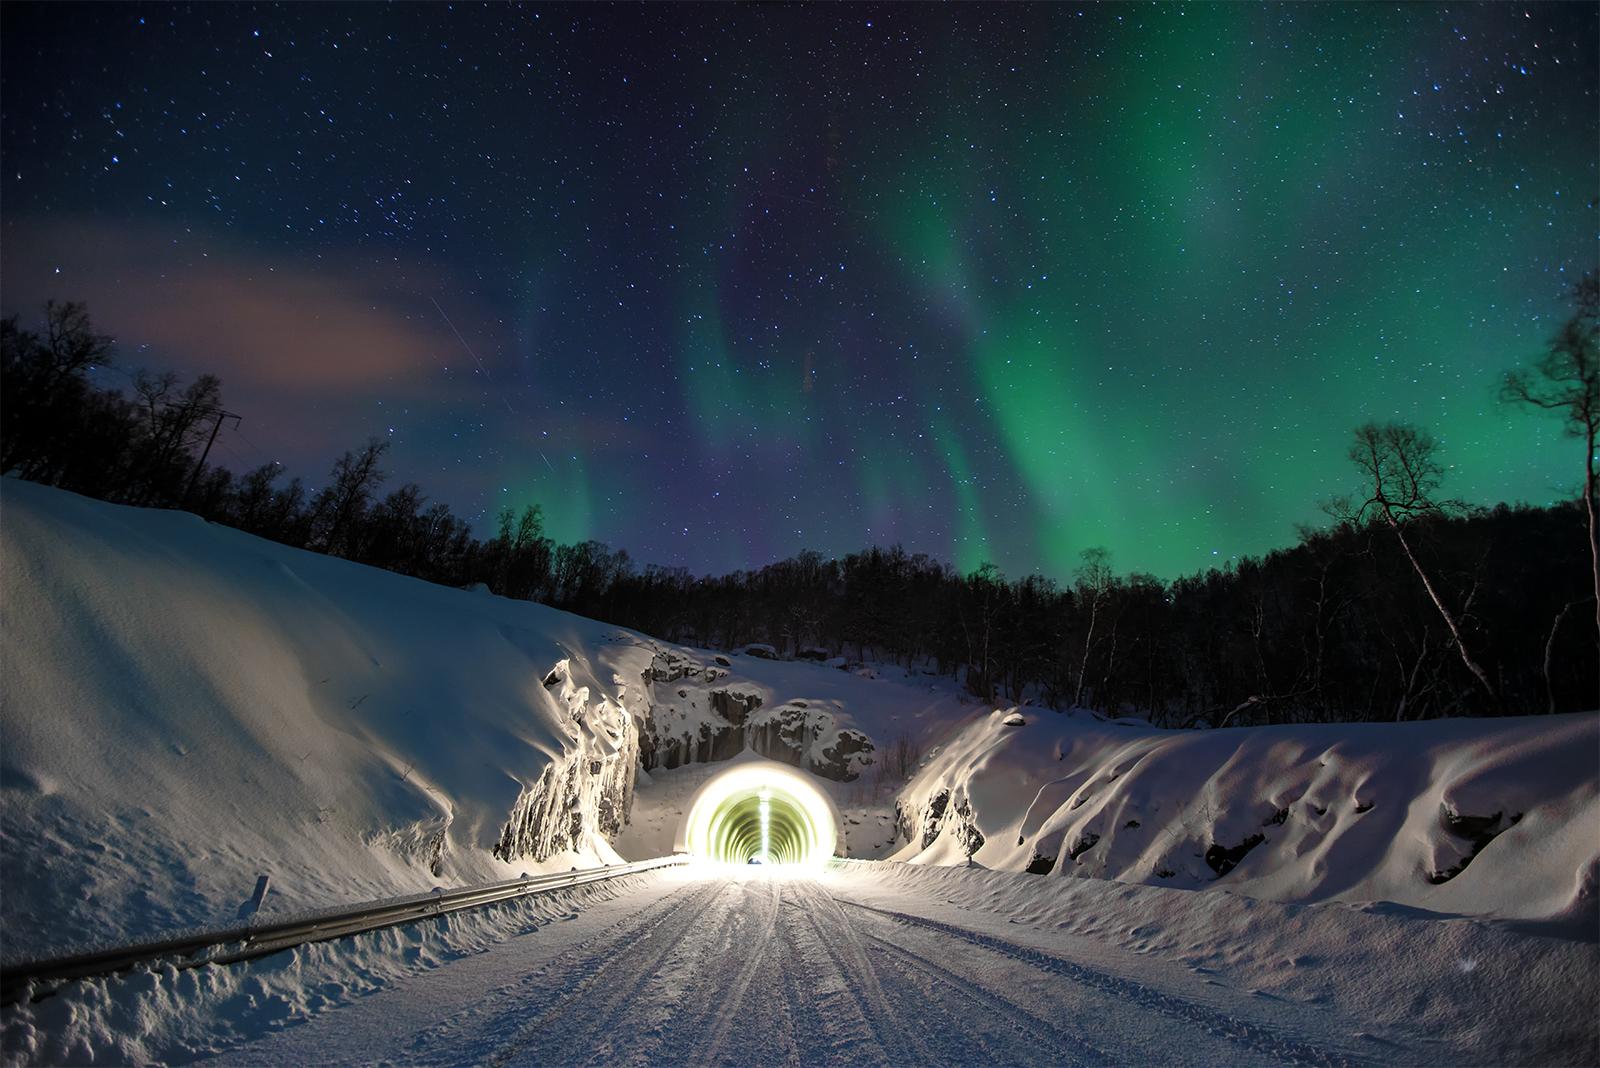 lofoten, northern lights, aurora borealis, evens, snow, tunnel, sky